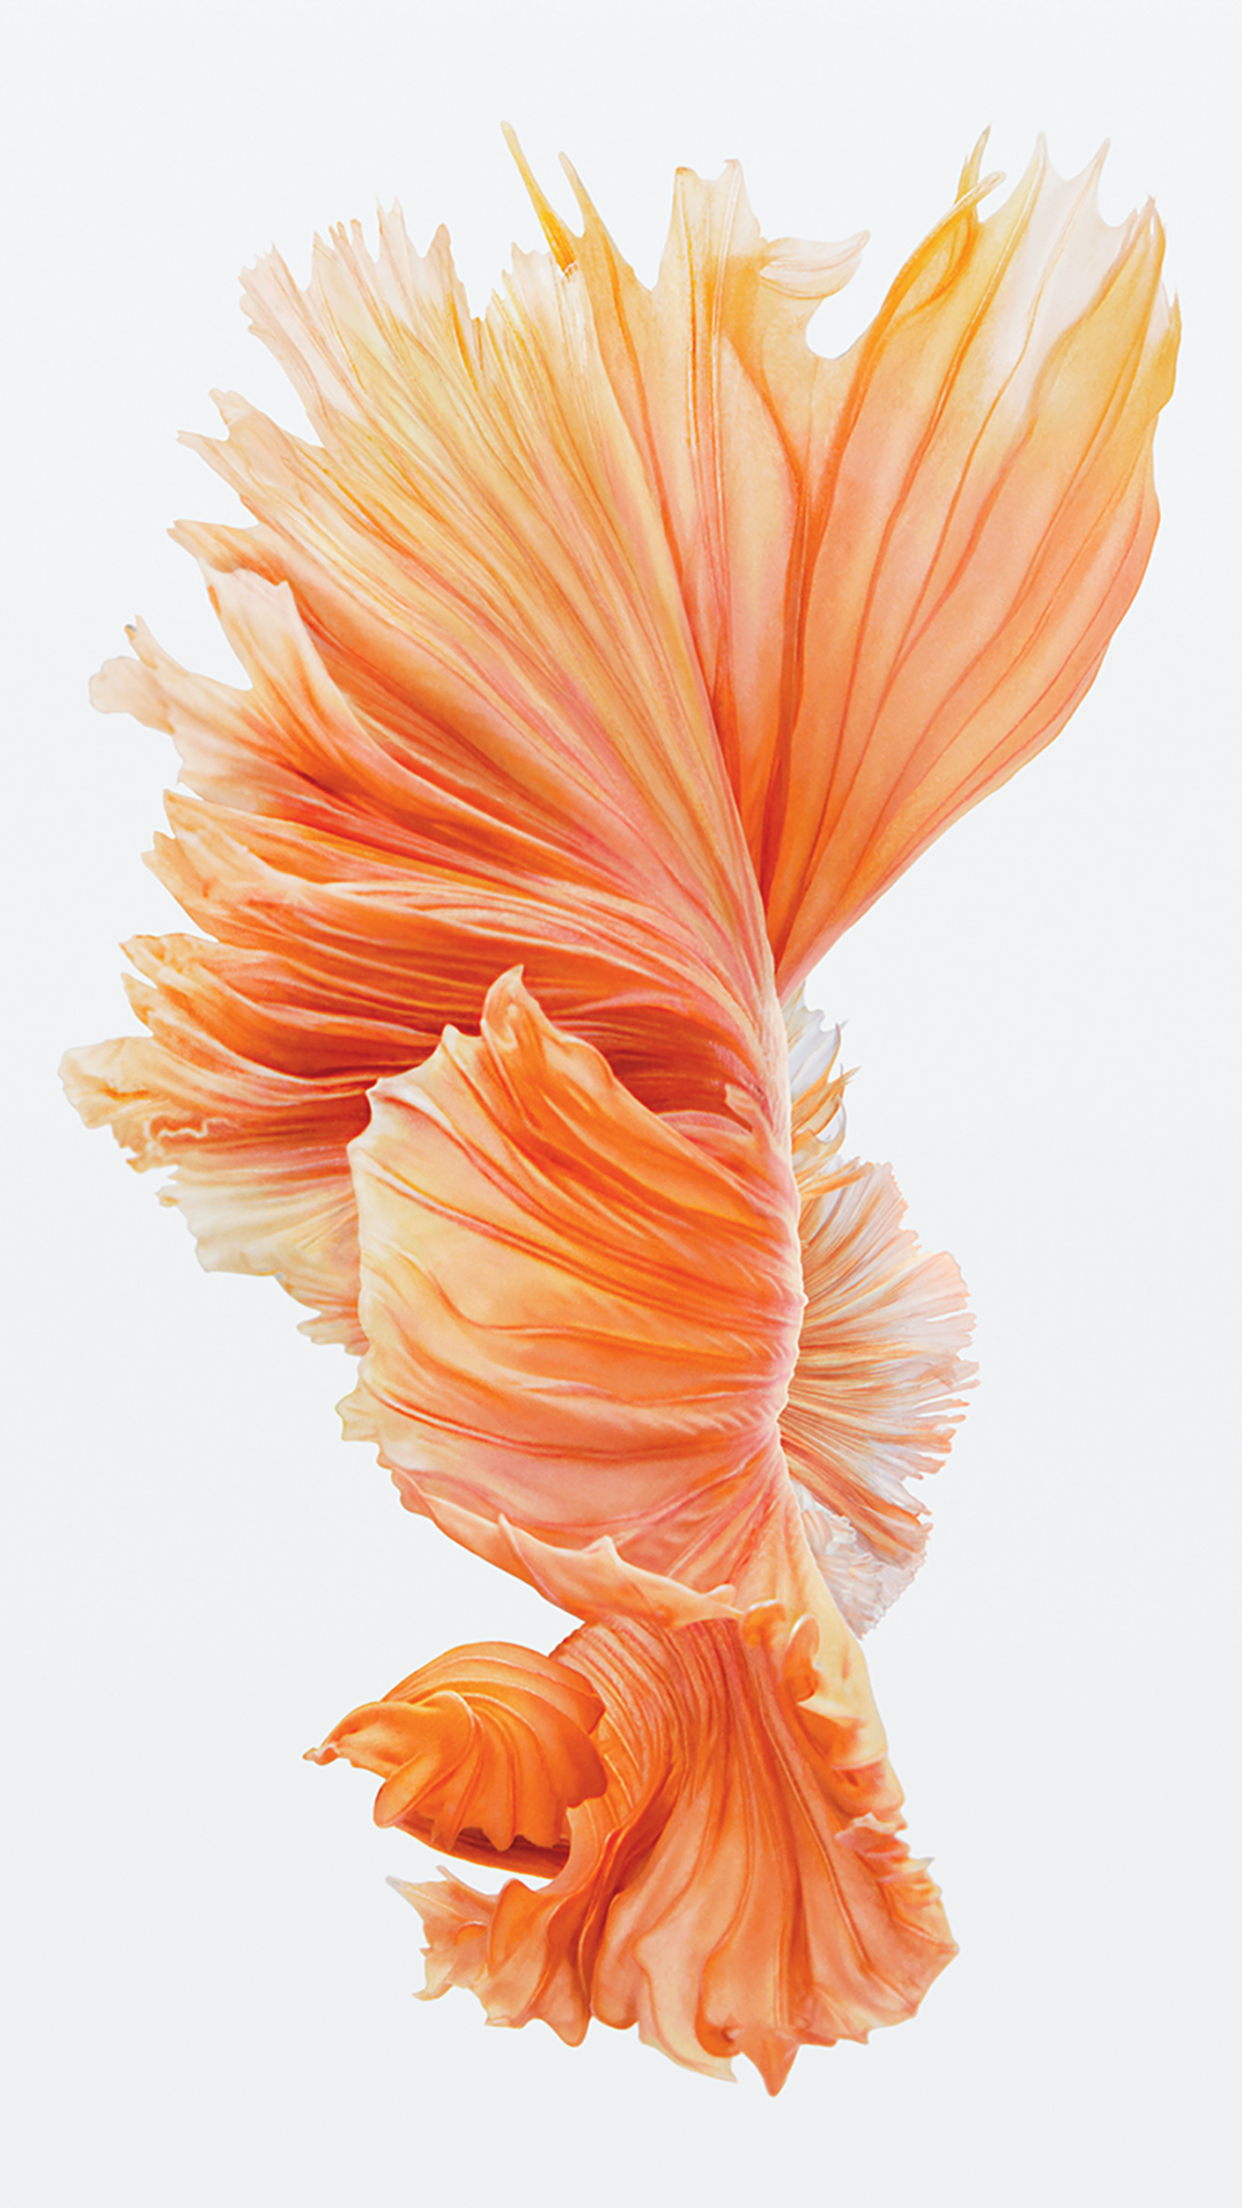 49+ iPhone 6s Betta Fish Wallpaper on WallpaperSafari